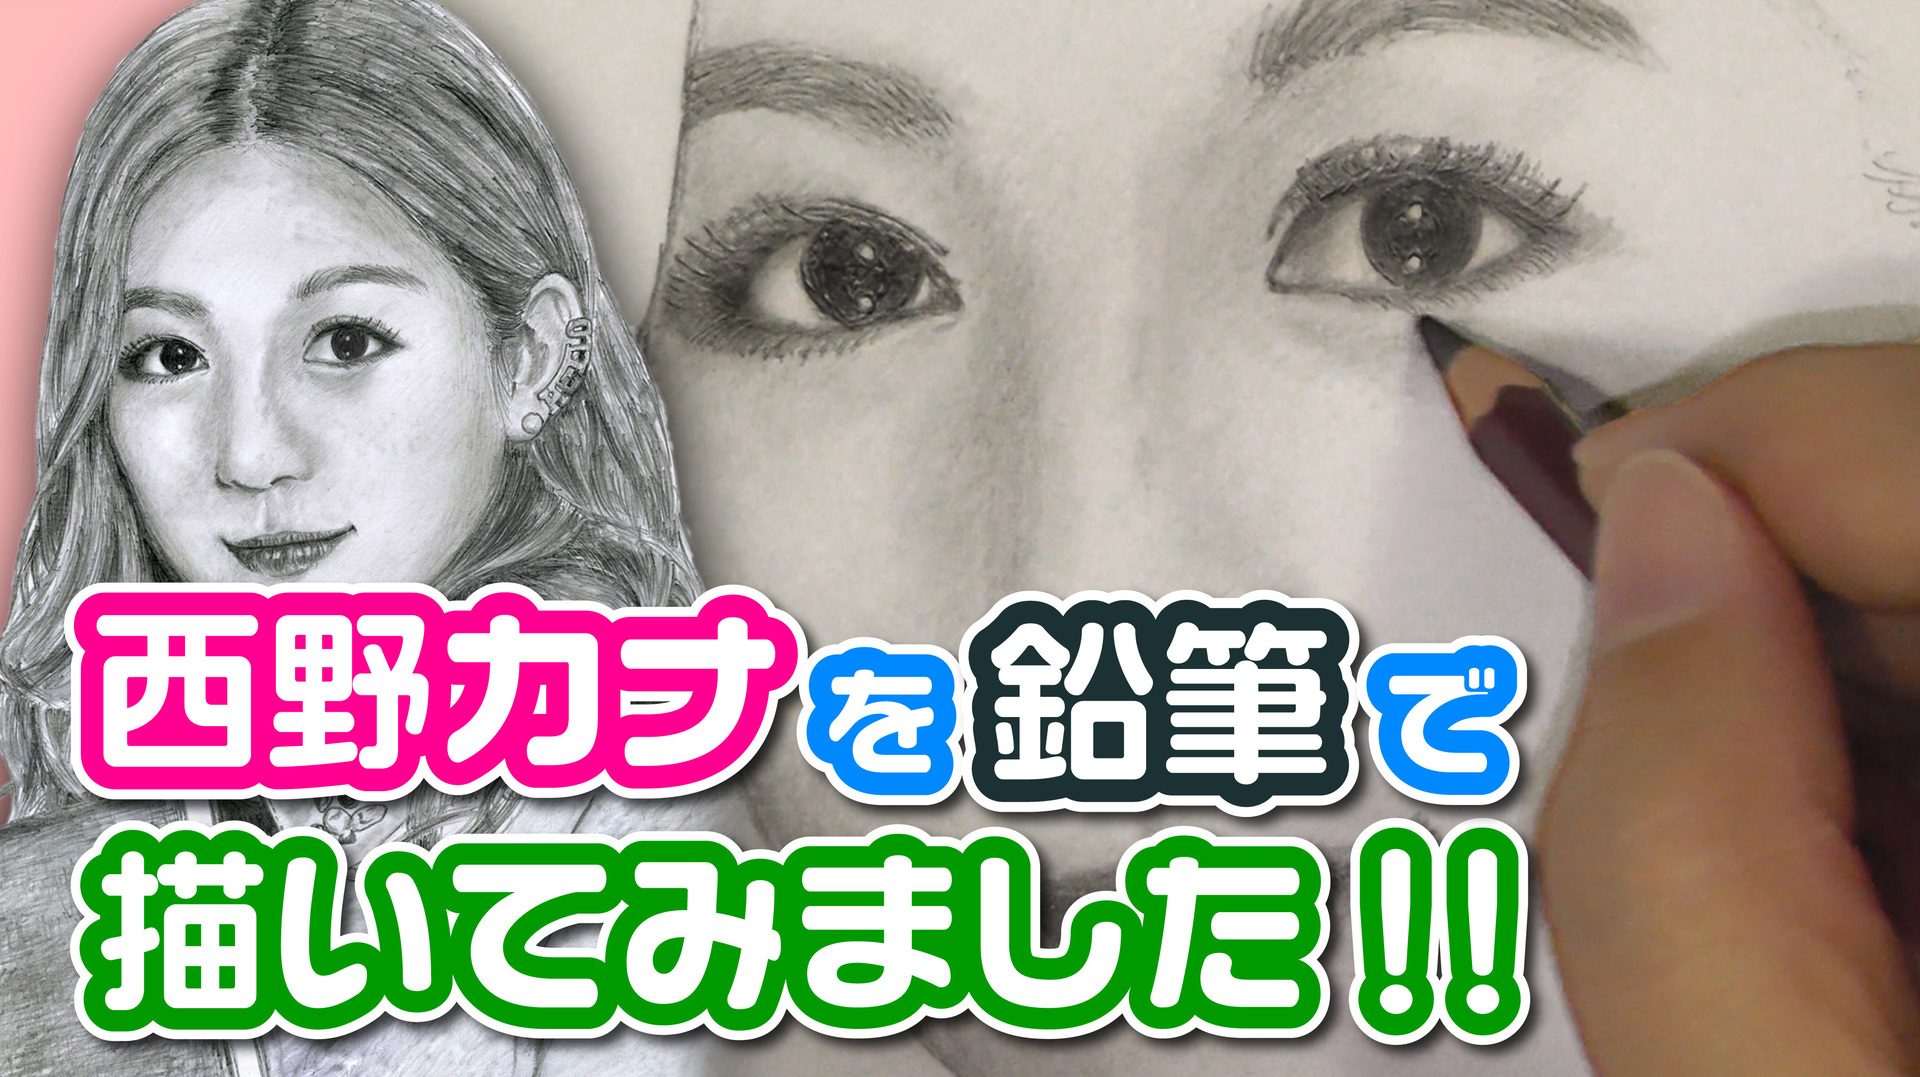 Youtubeサムネイル 西野カナ鉛筆画.jpg